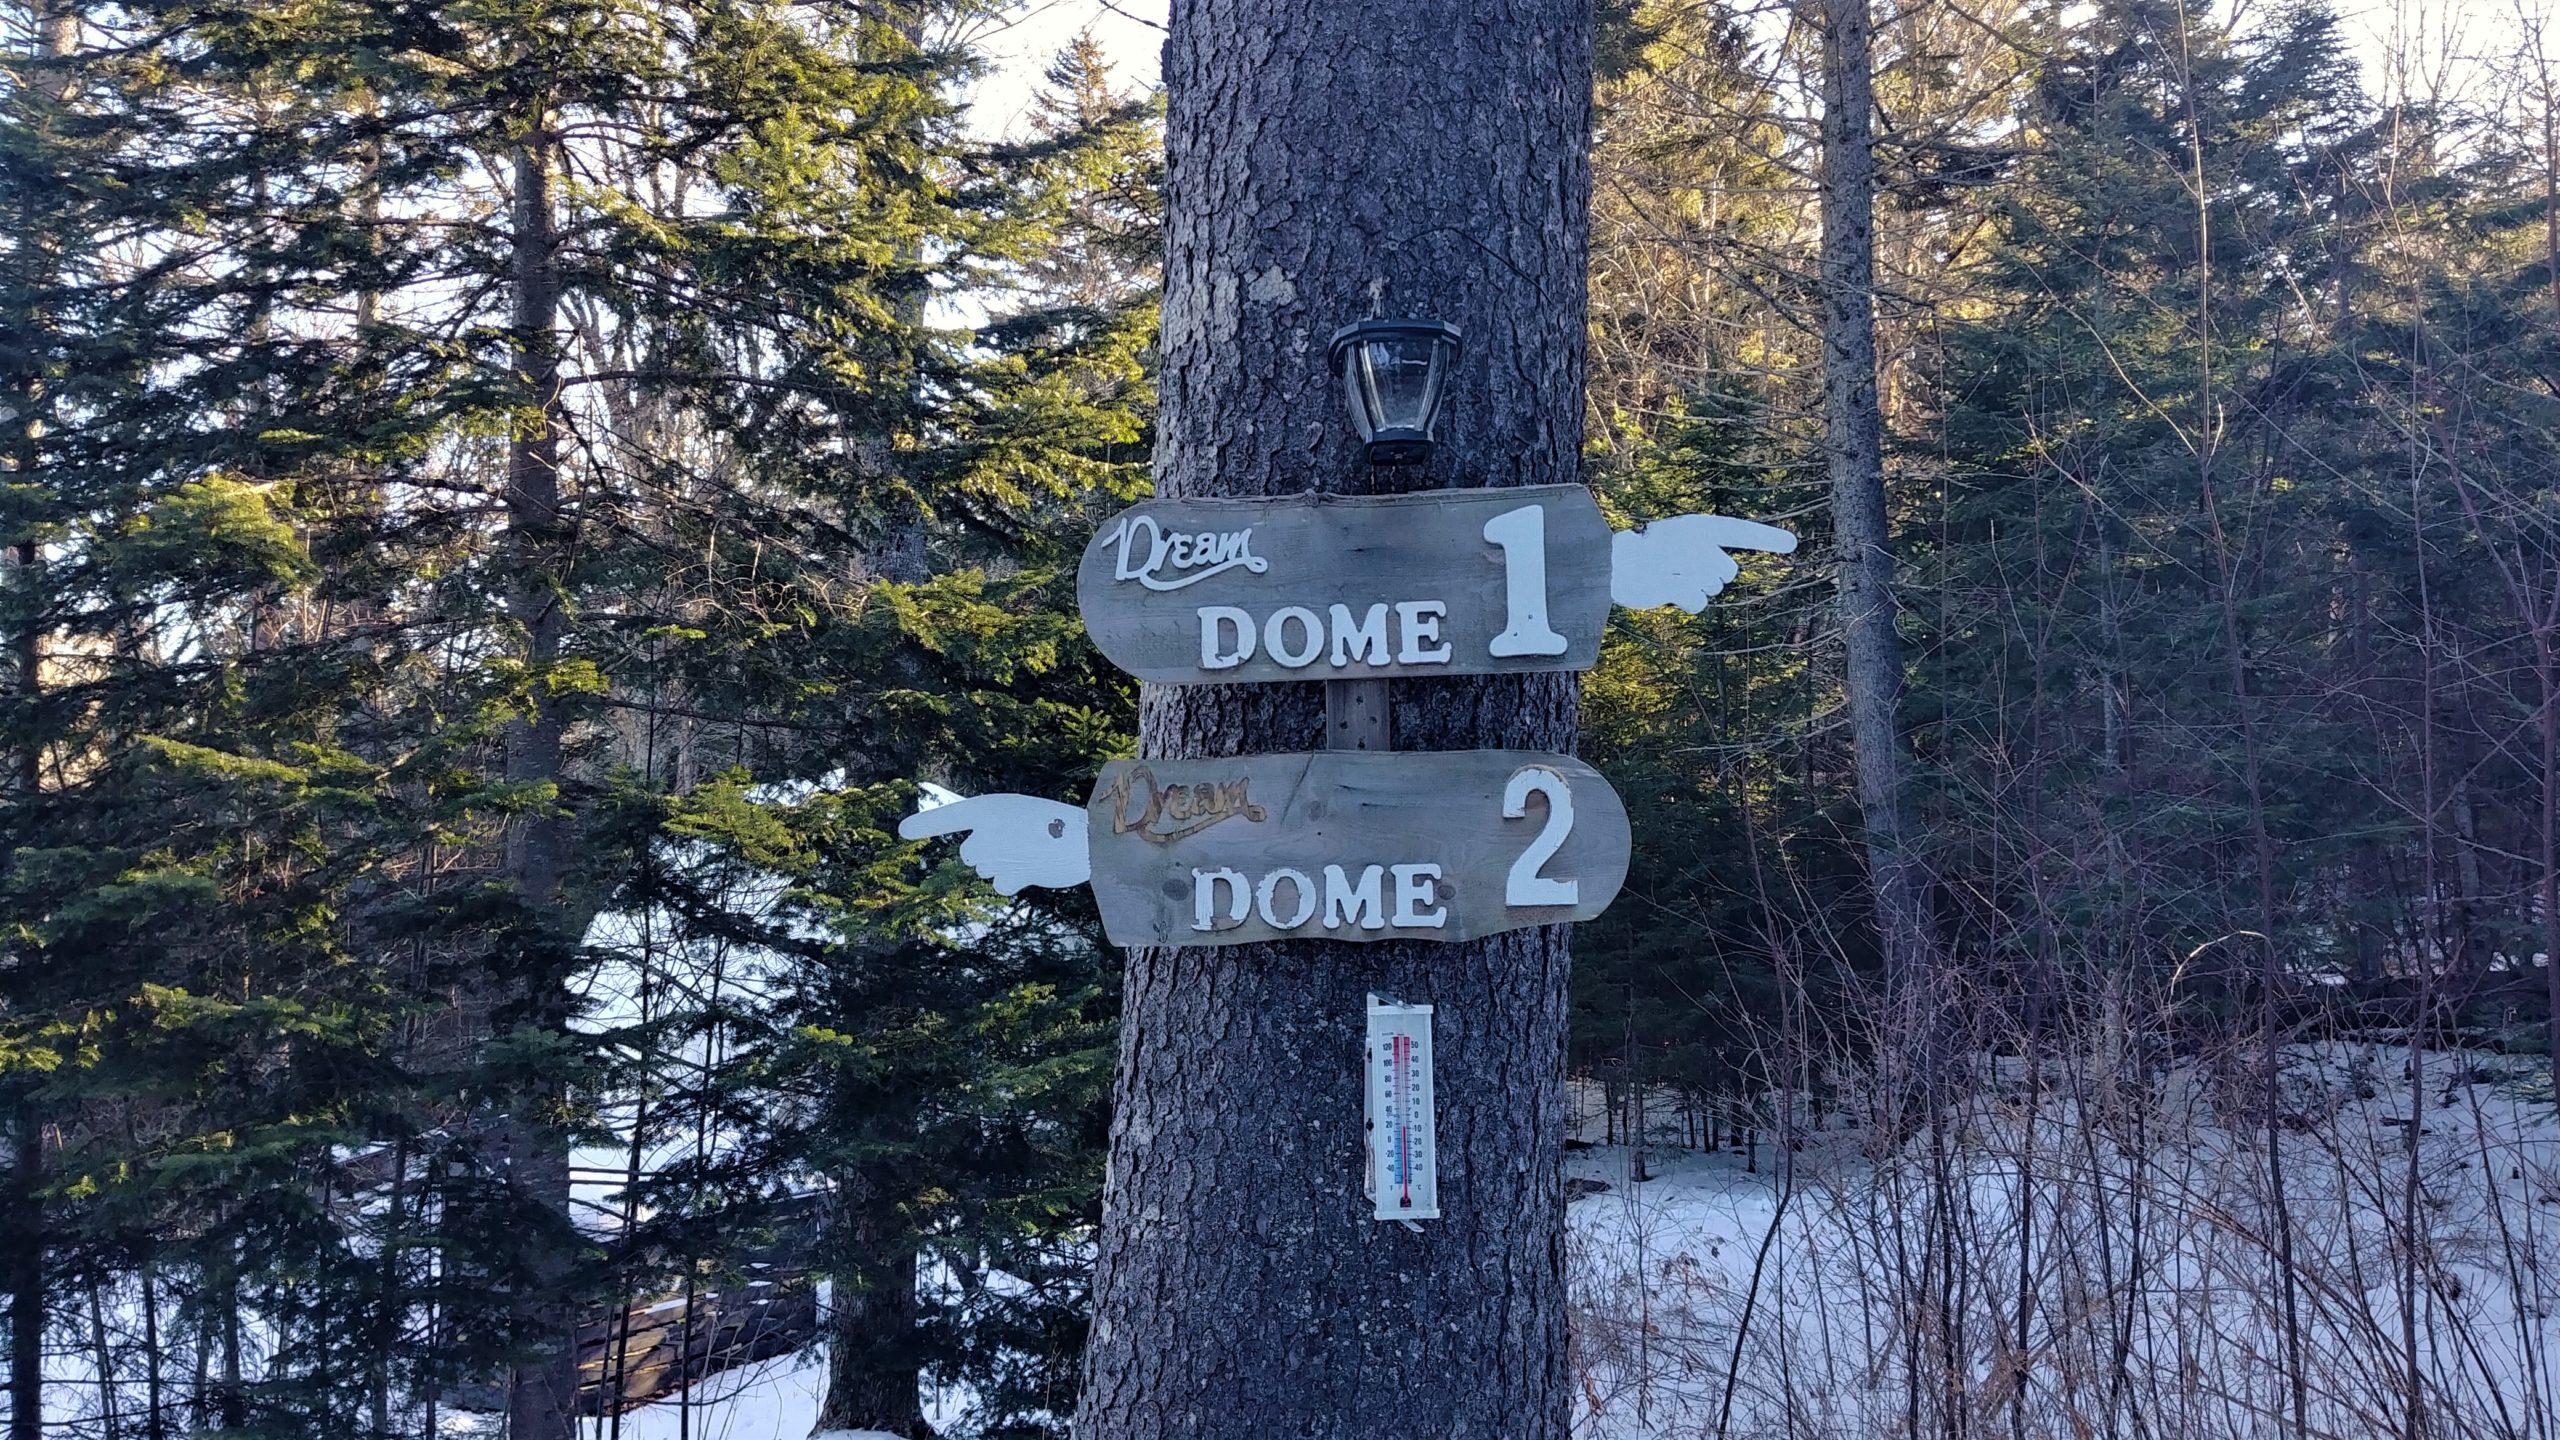 reserver ridgeback lodge voyage nouveau-brunswick canada